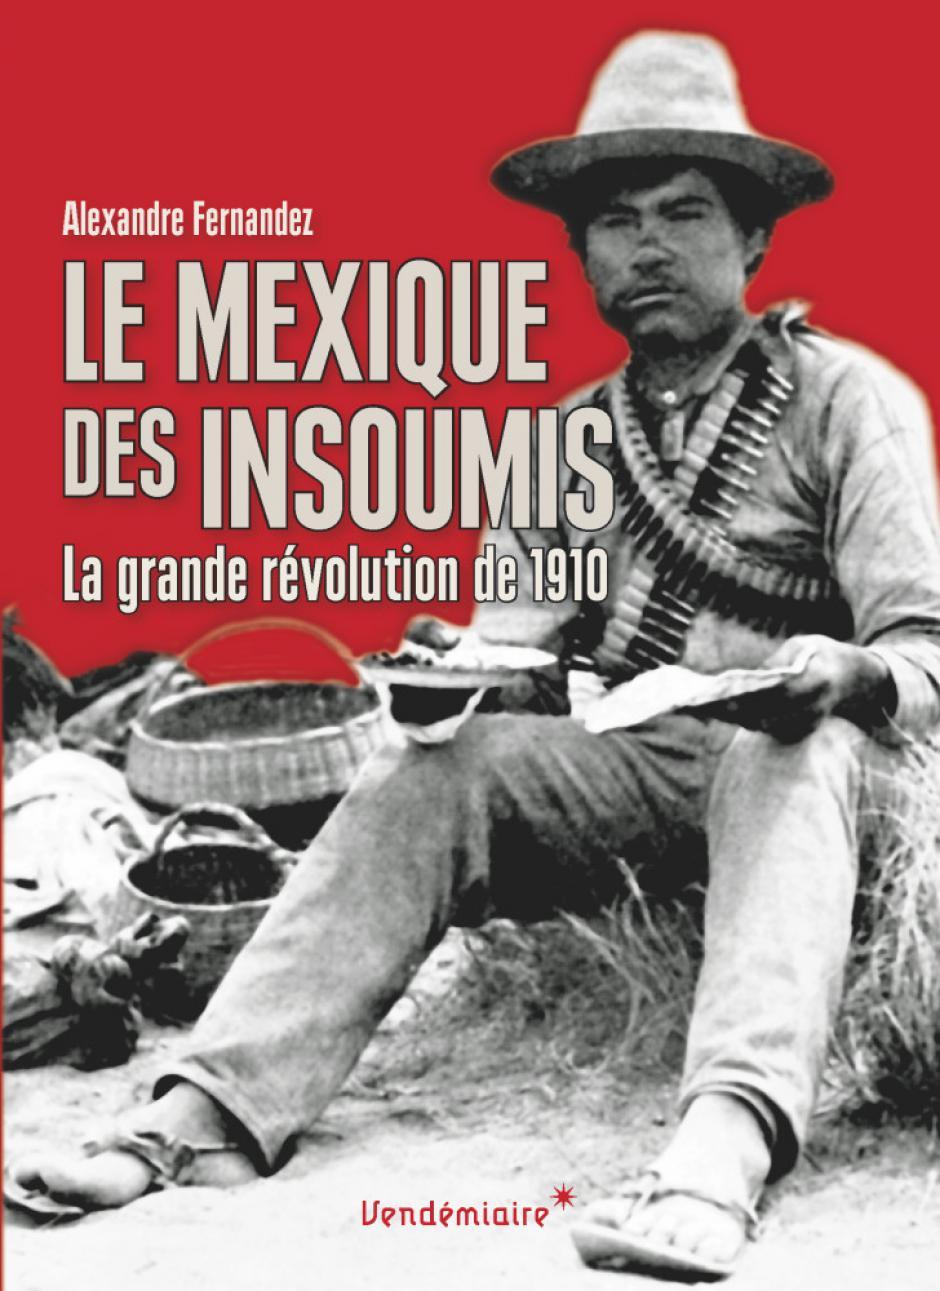 La Révolution mexicaine (1910-1920), Alexandre Fernandez*